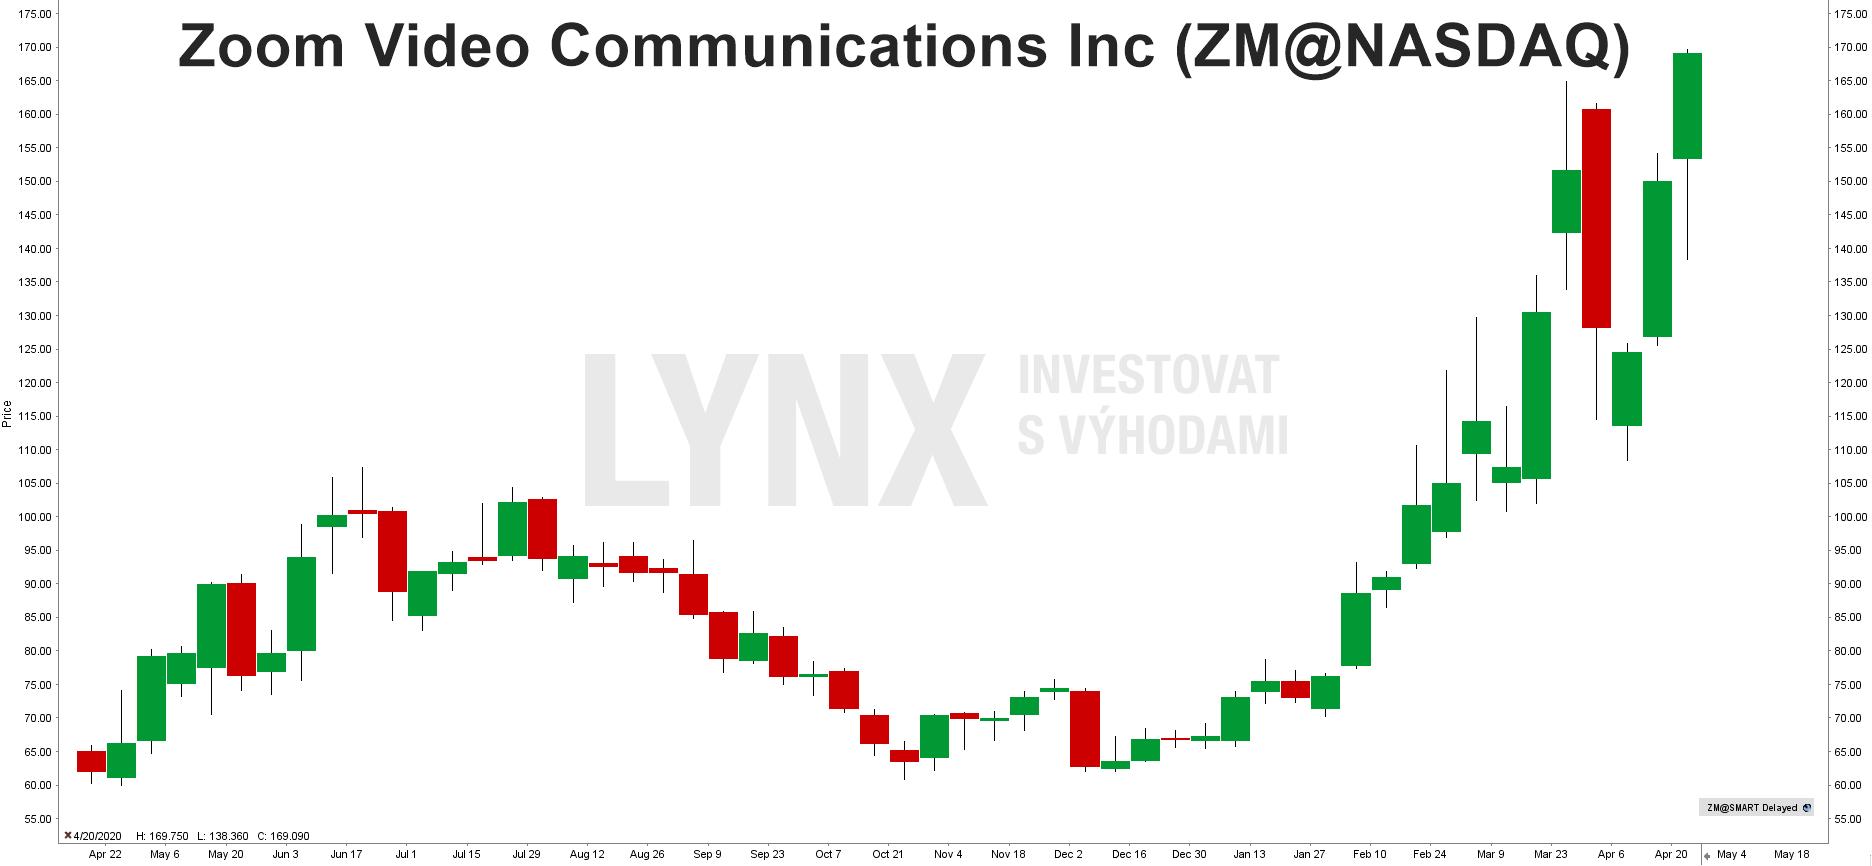 Graf Zoom Video Communications (ZM)